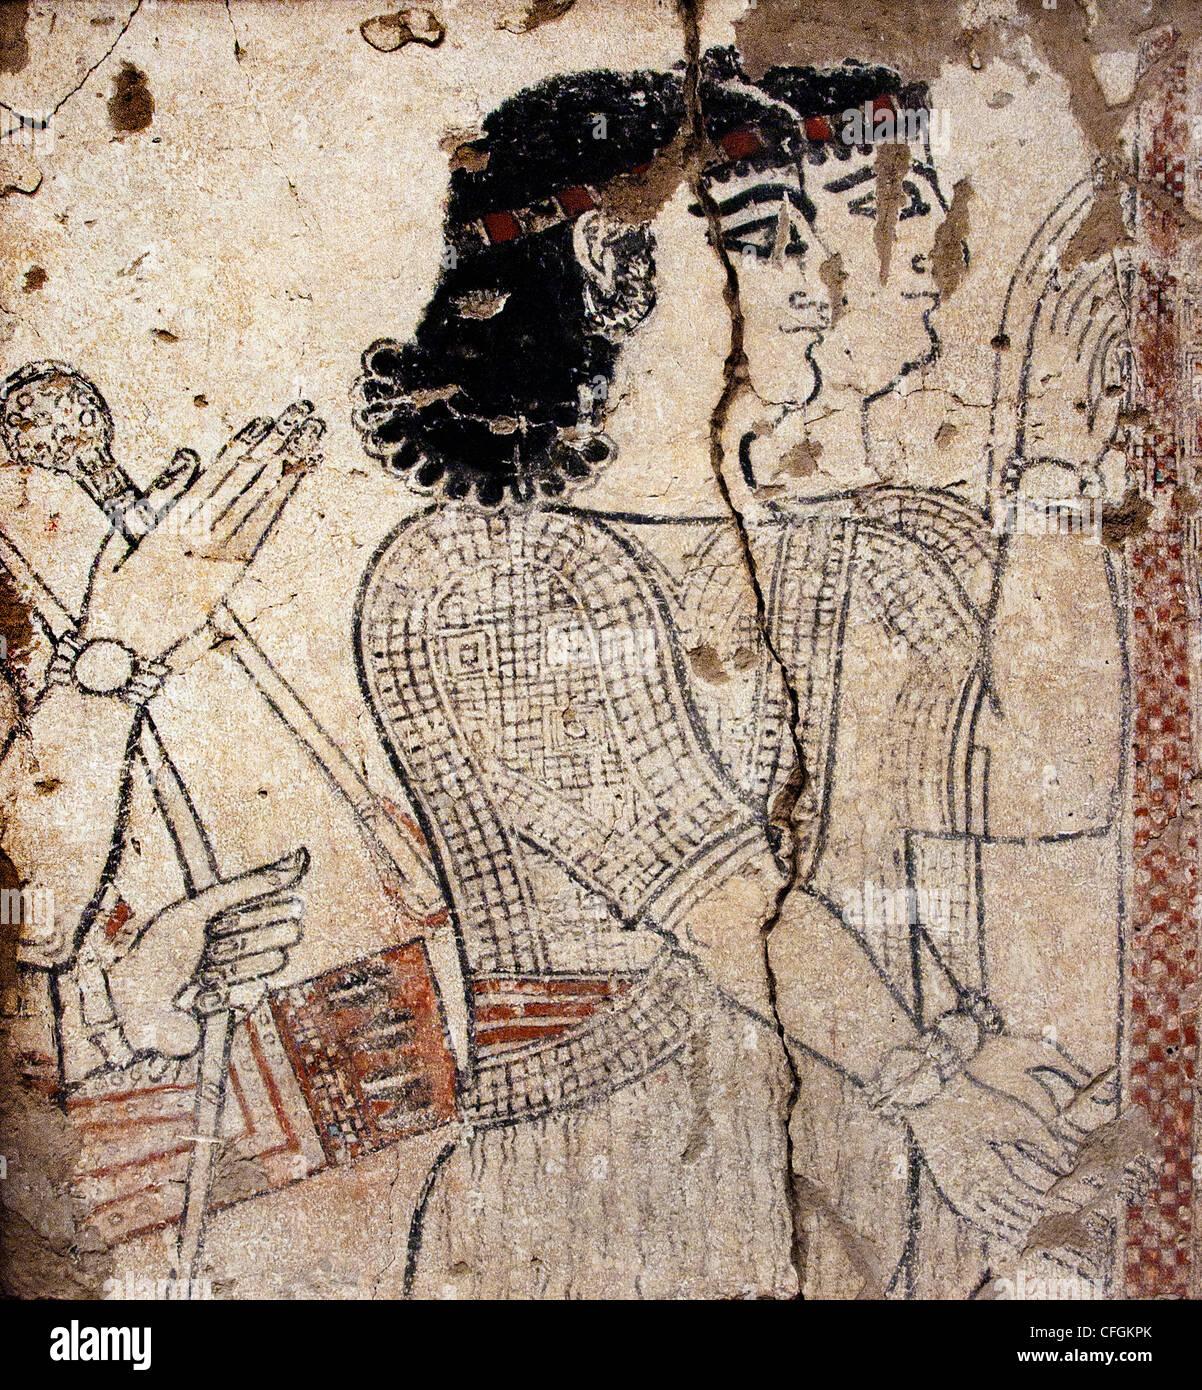 Servants Royal Palace of Nimrud Tiglath Pileser III Century BC 8  Assyrian city Iraq - Stock Image